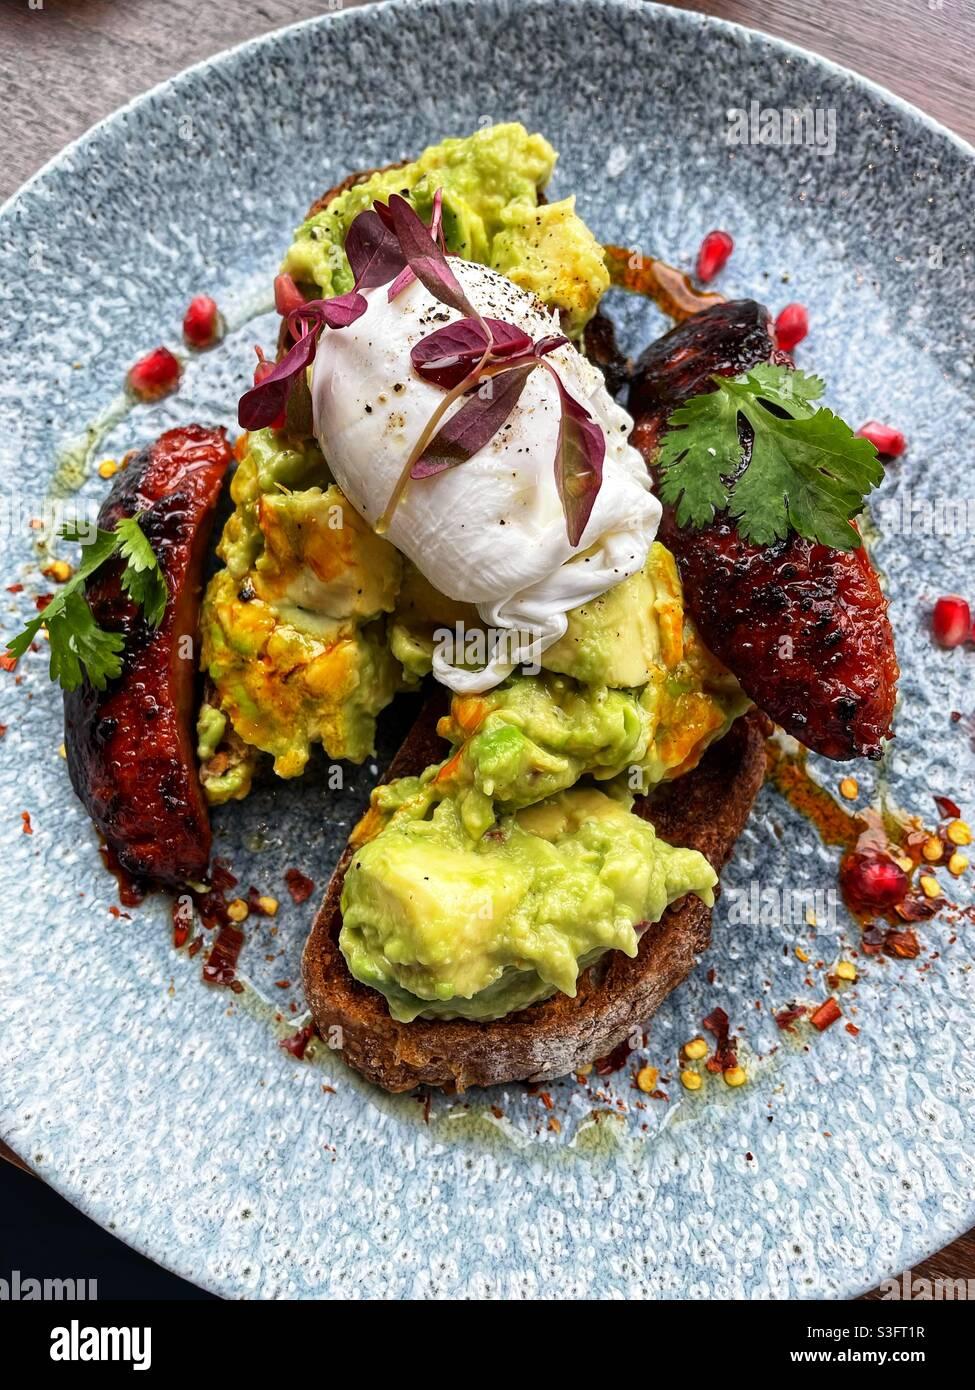 Frühstück der Millennials- Avocado auf Toast… Stockfoto